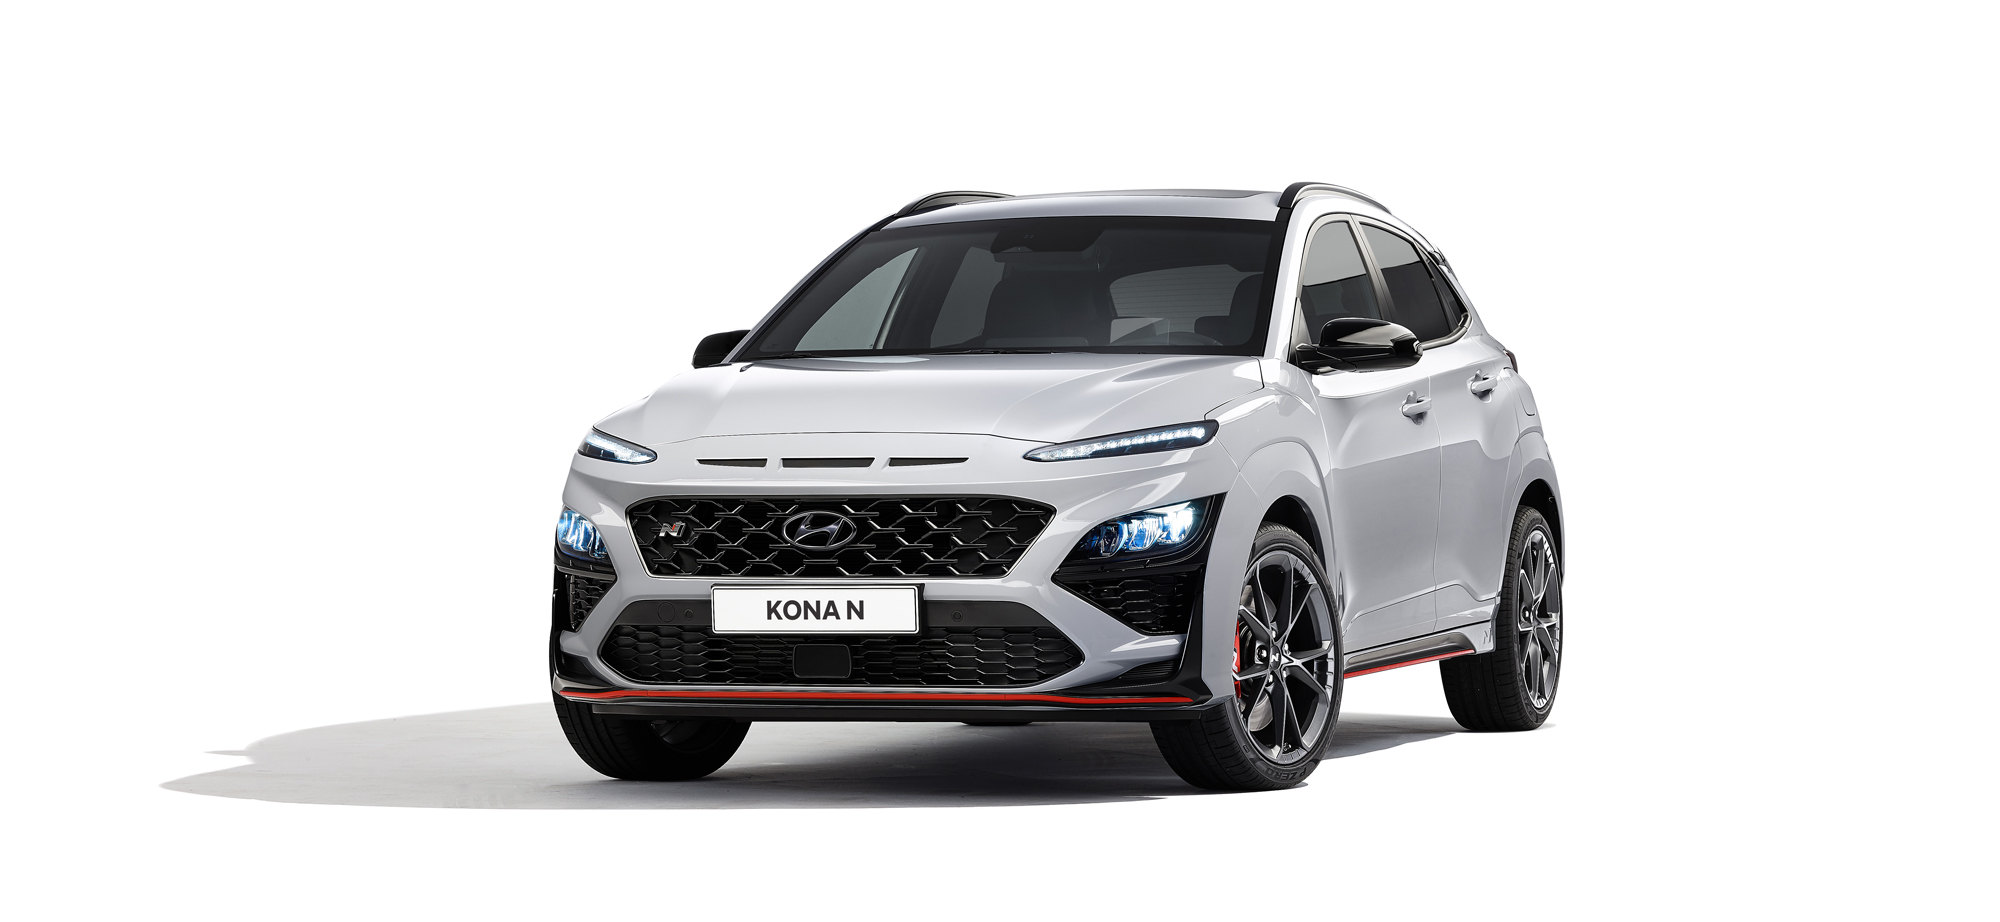 Hyundai Kona N front 2